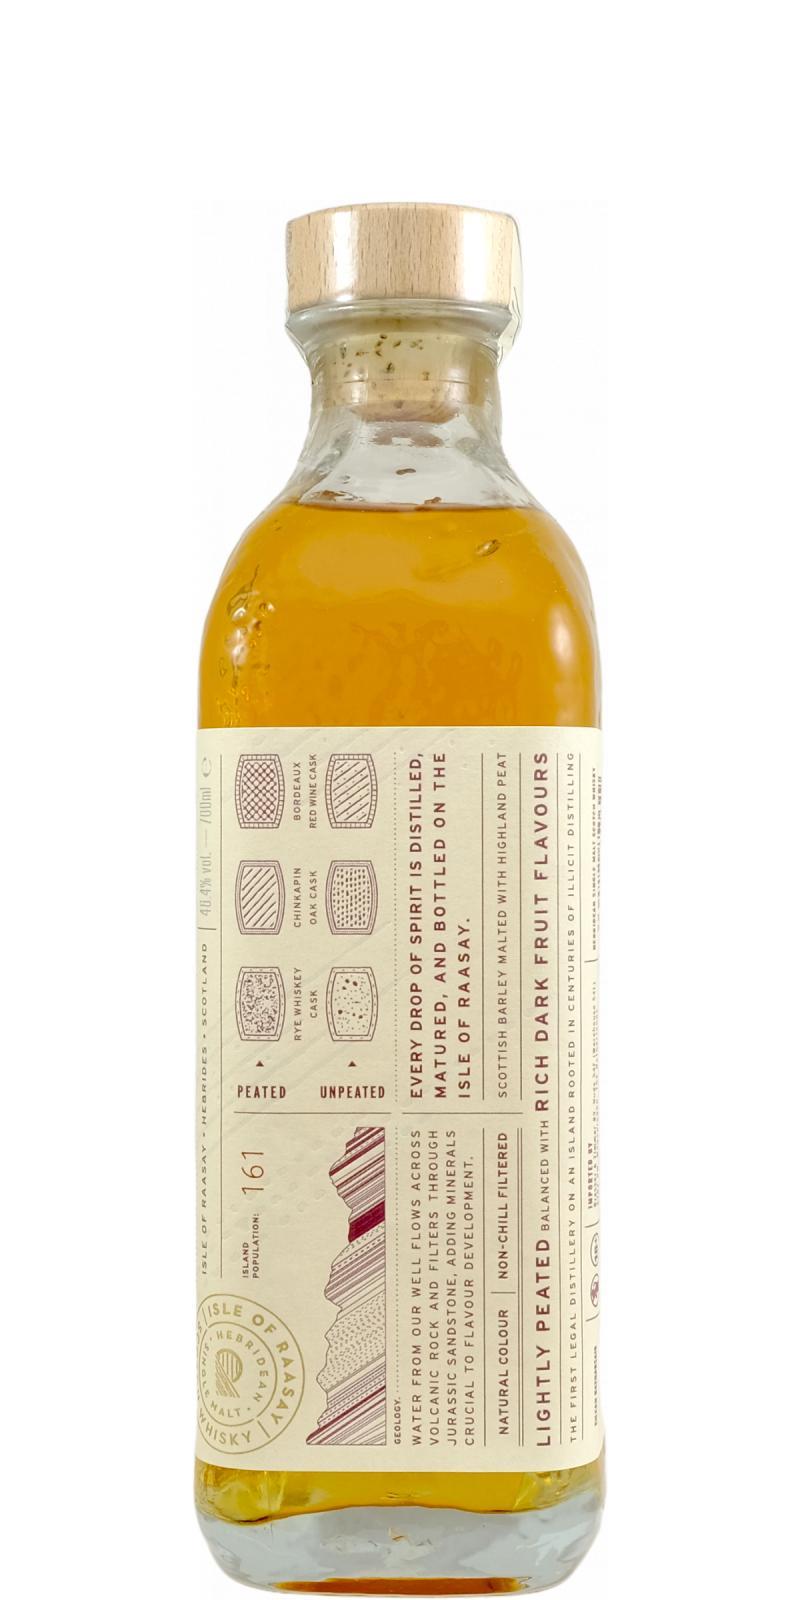 Raasay Hebridean Single Malt Scotch Whisky